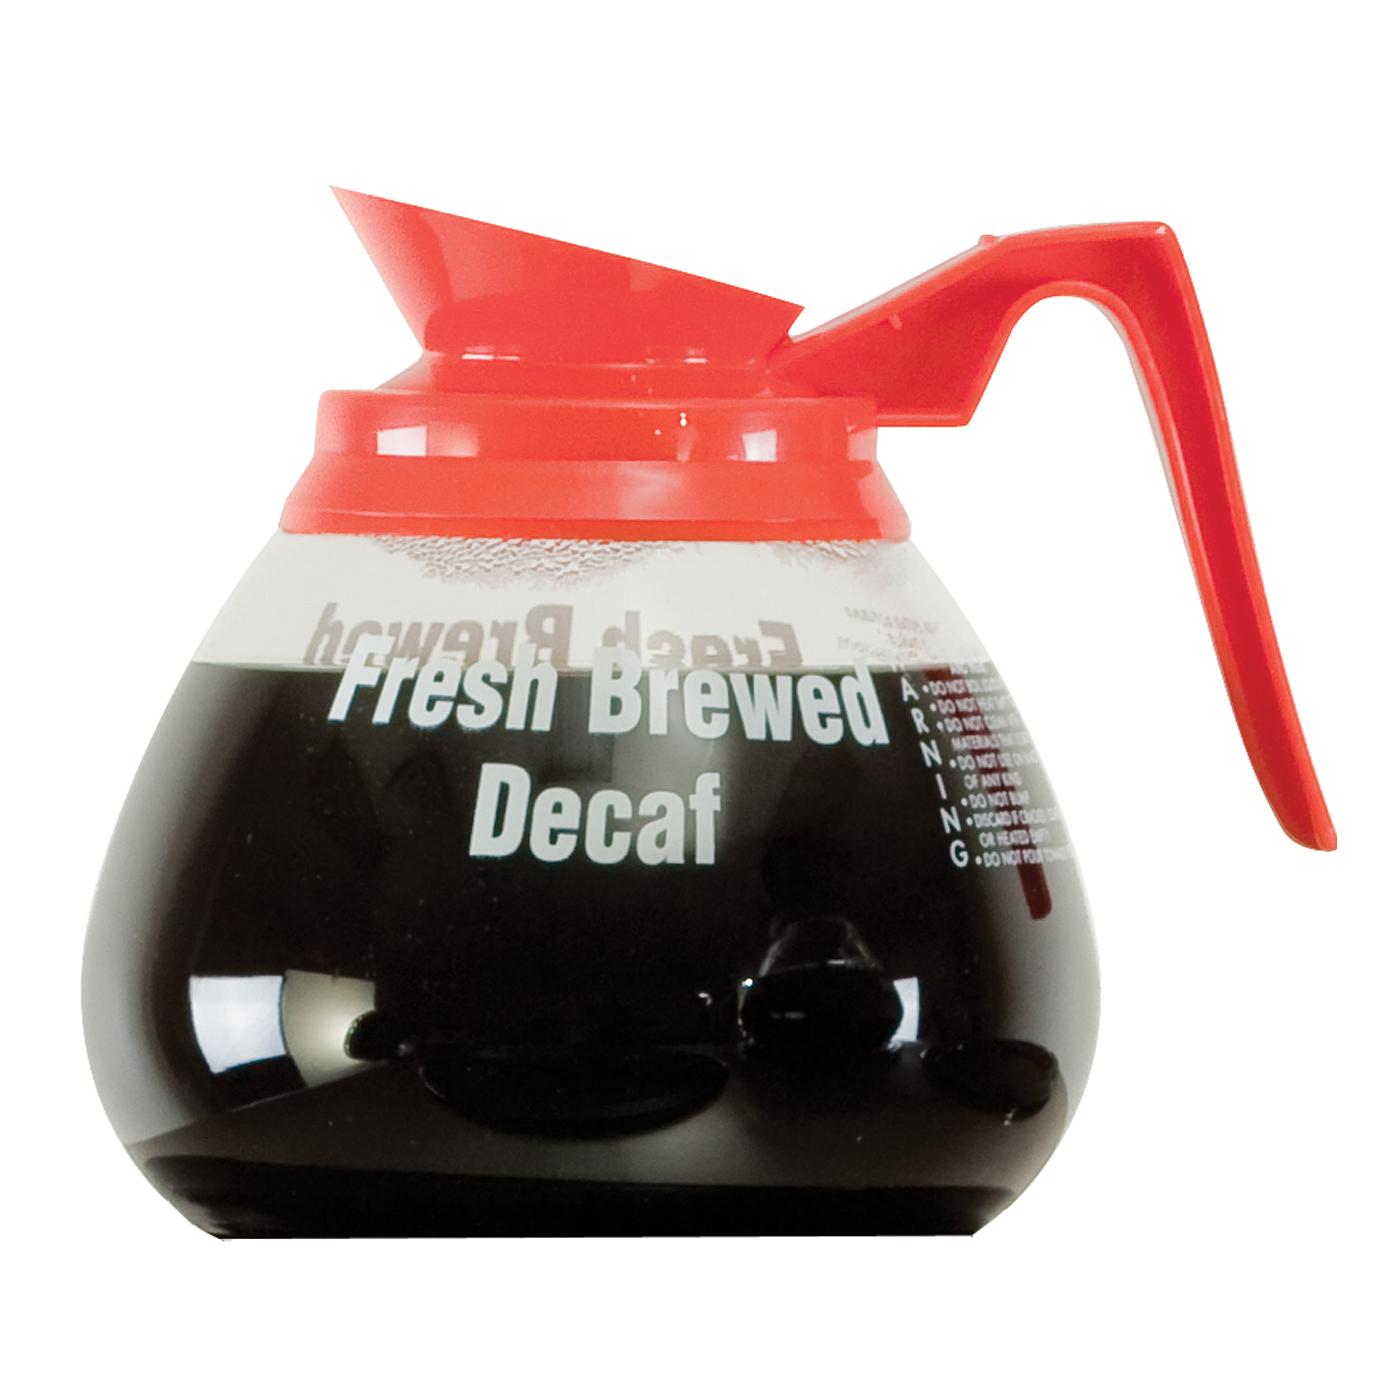 Grindmaster-Cecilware 98006 coffee decanter